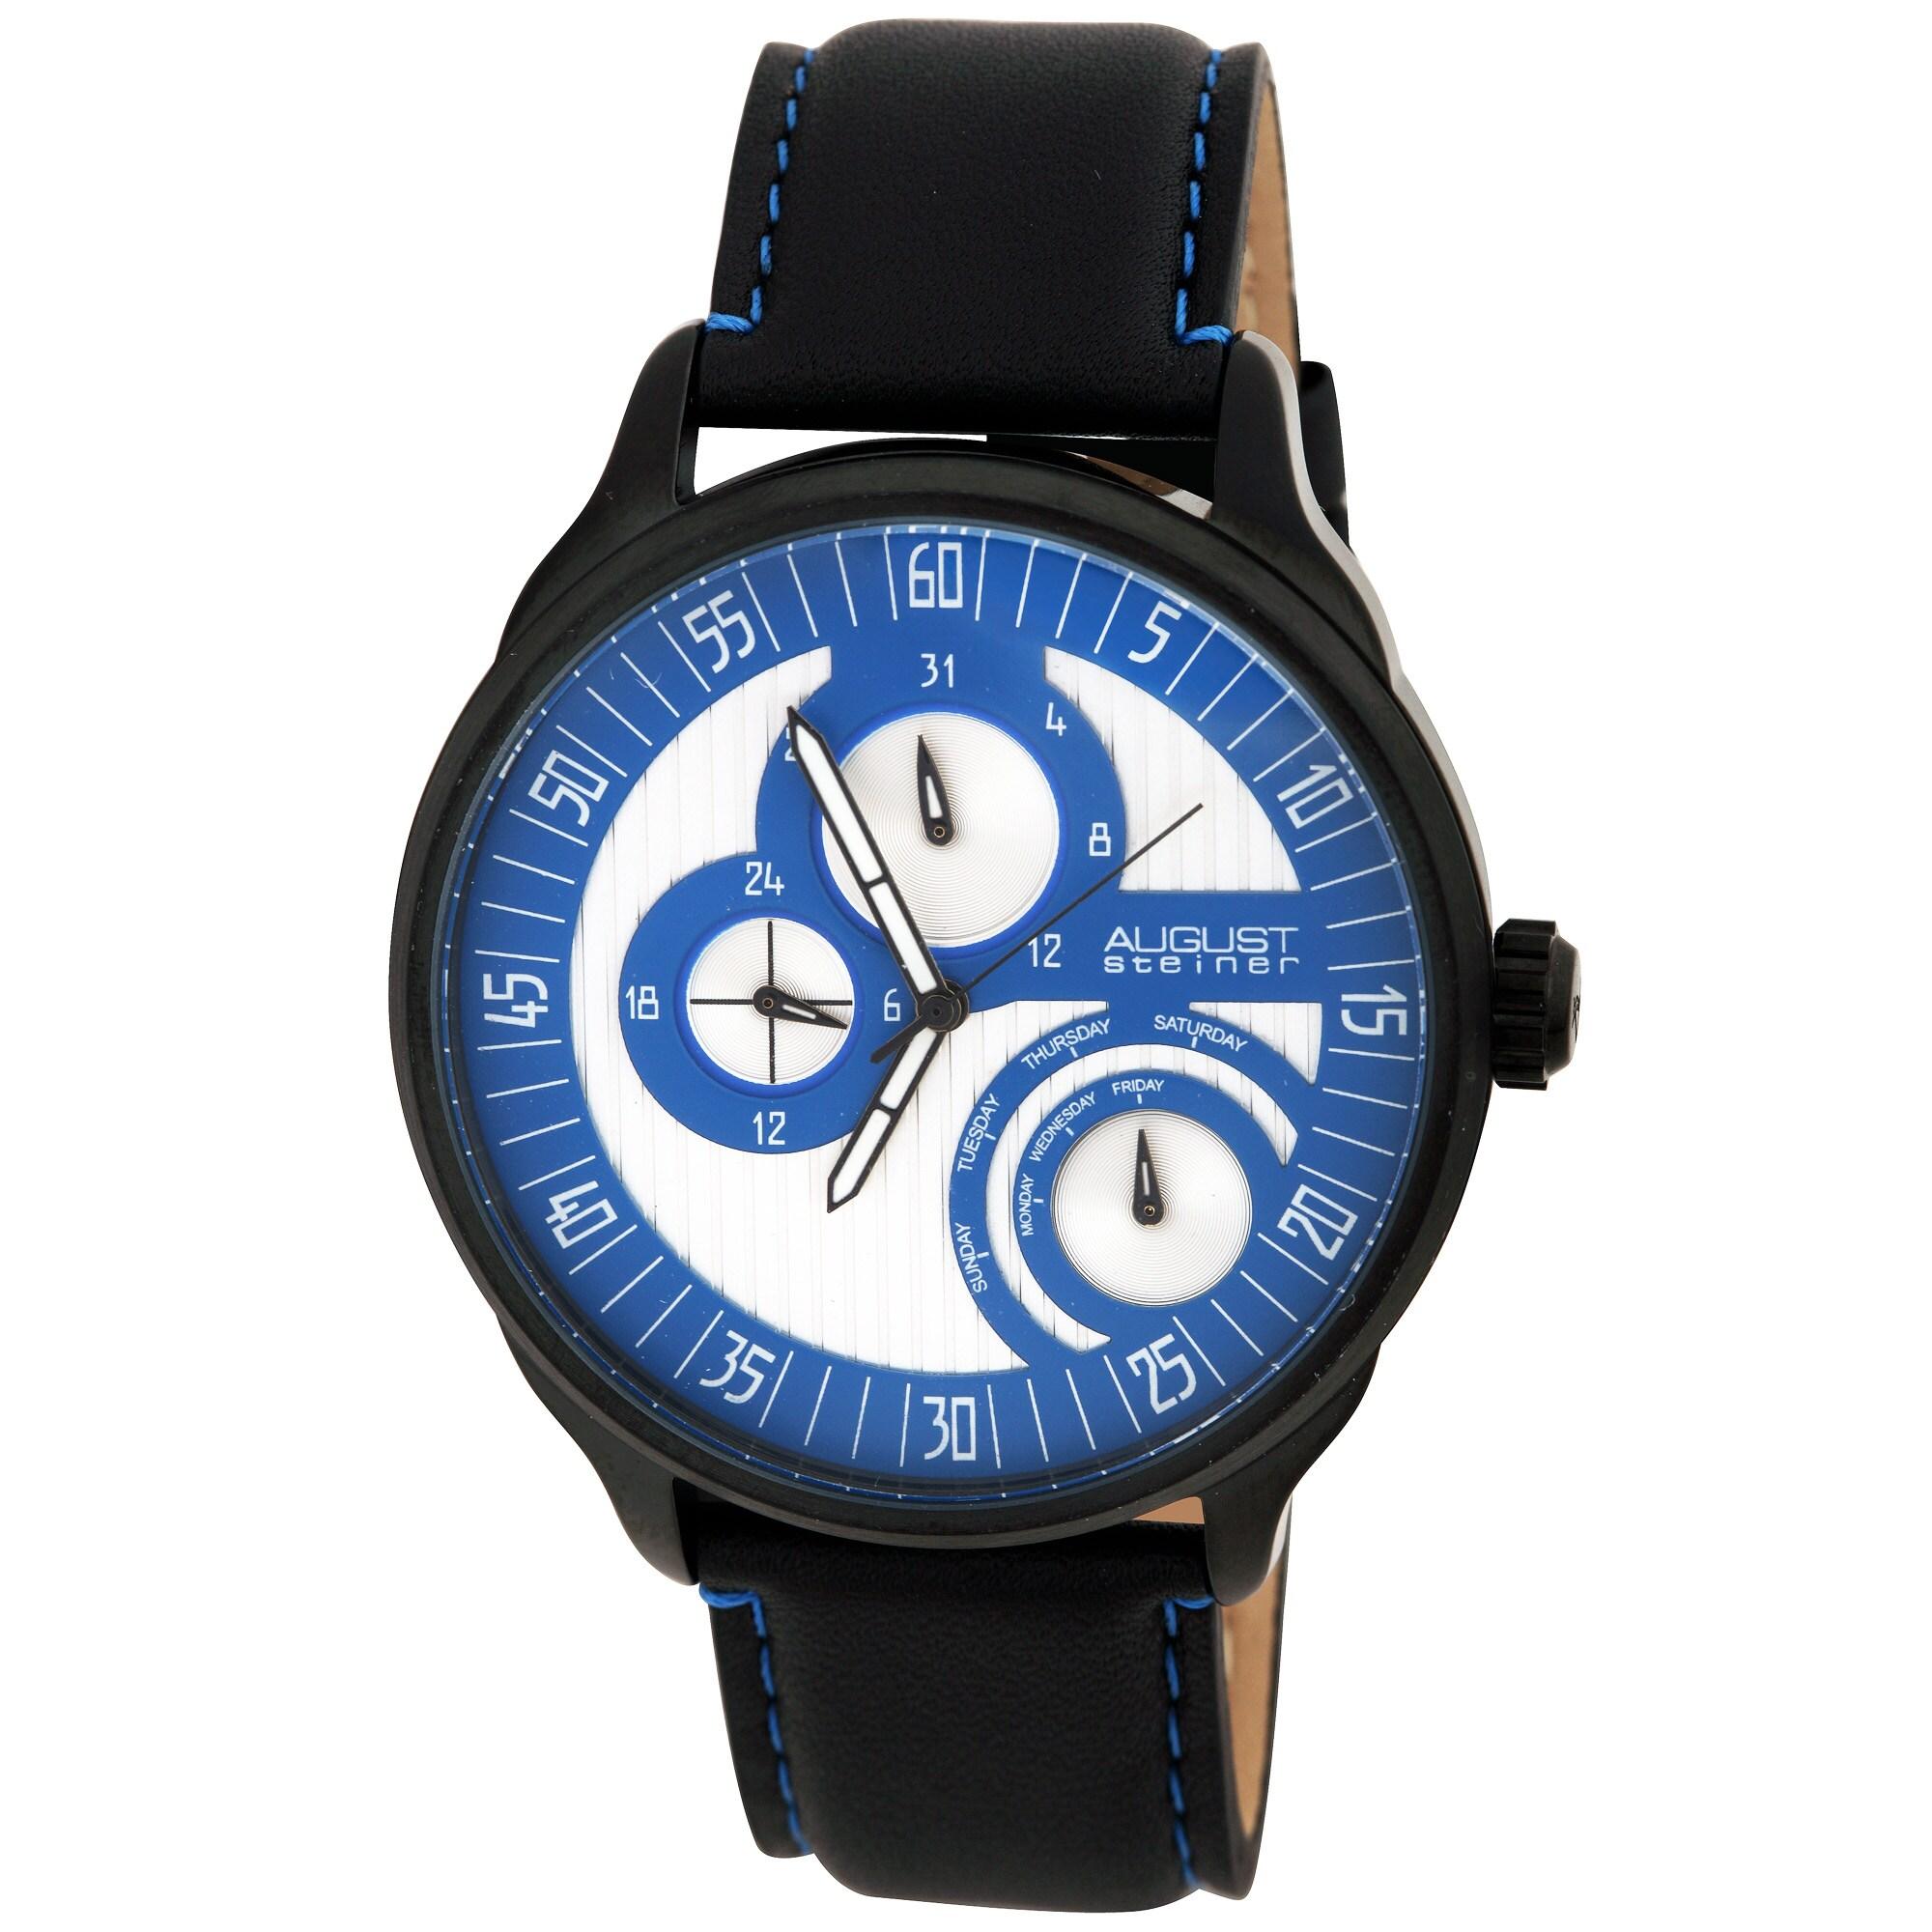 August Steiner Men's Stainless Steel Multifunction Leather Watch